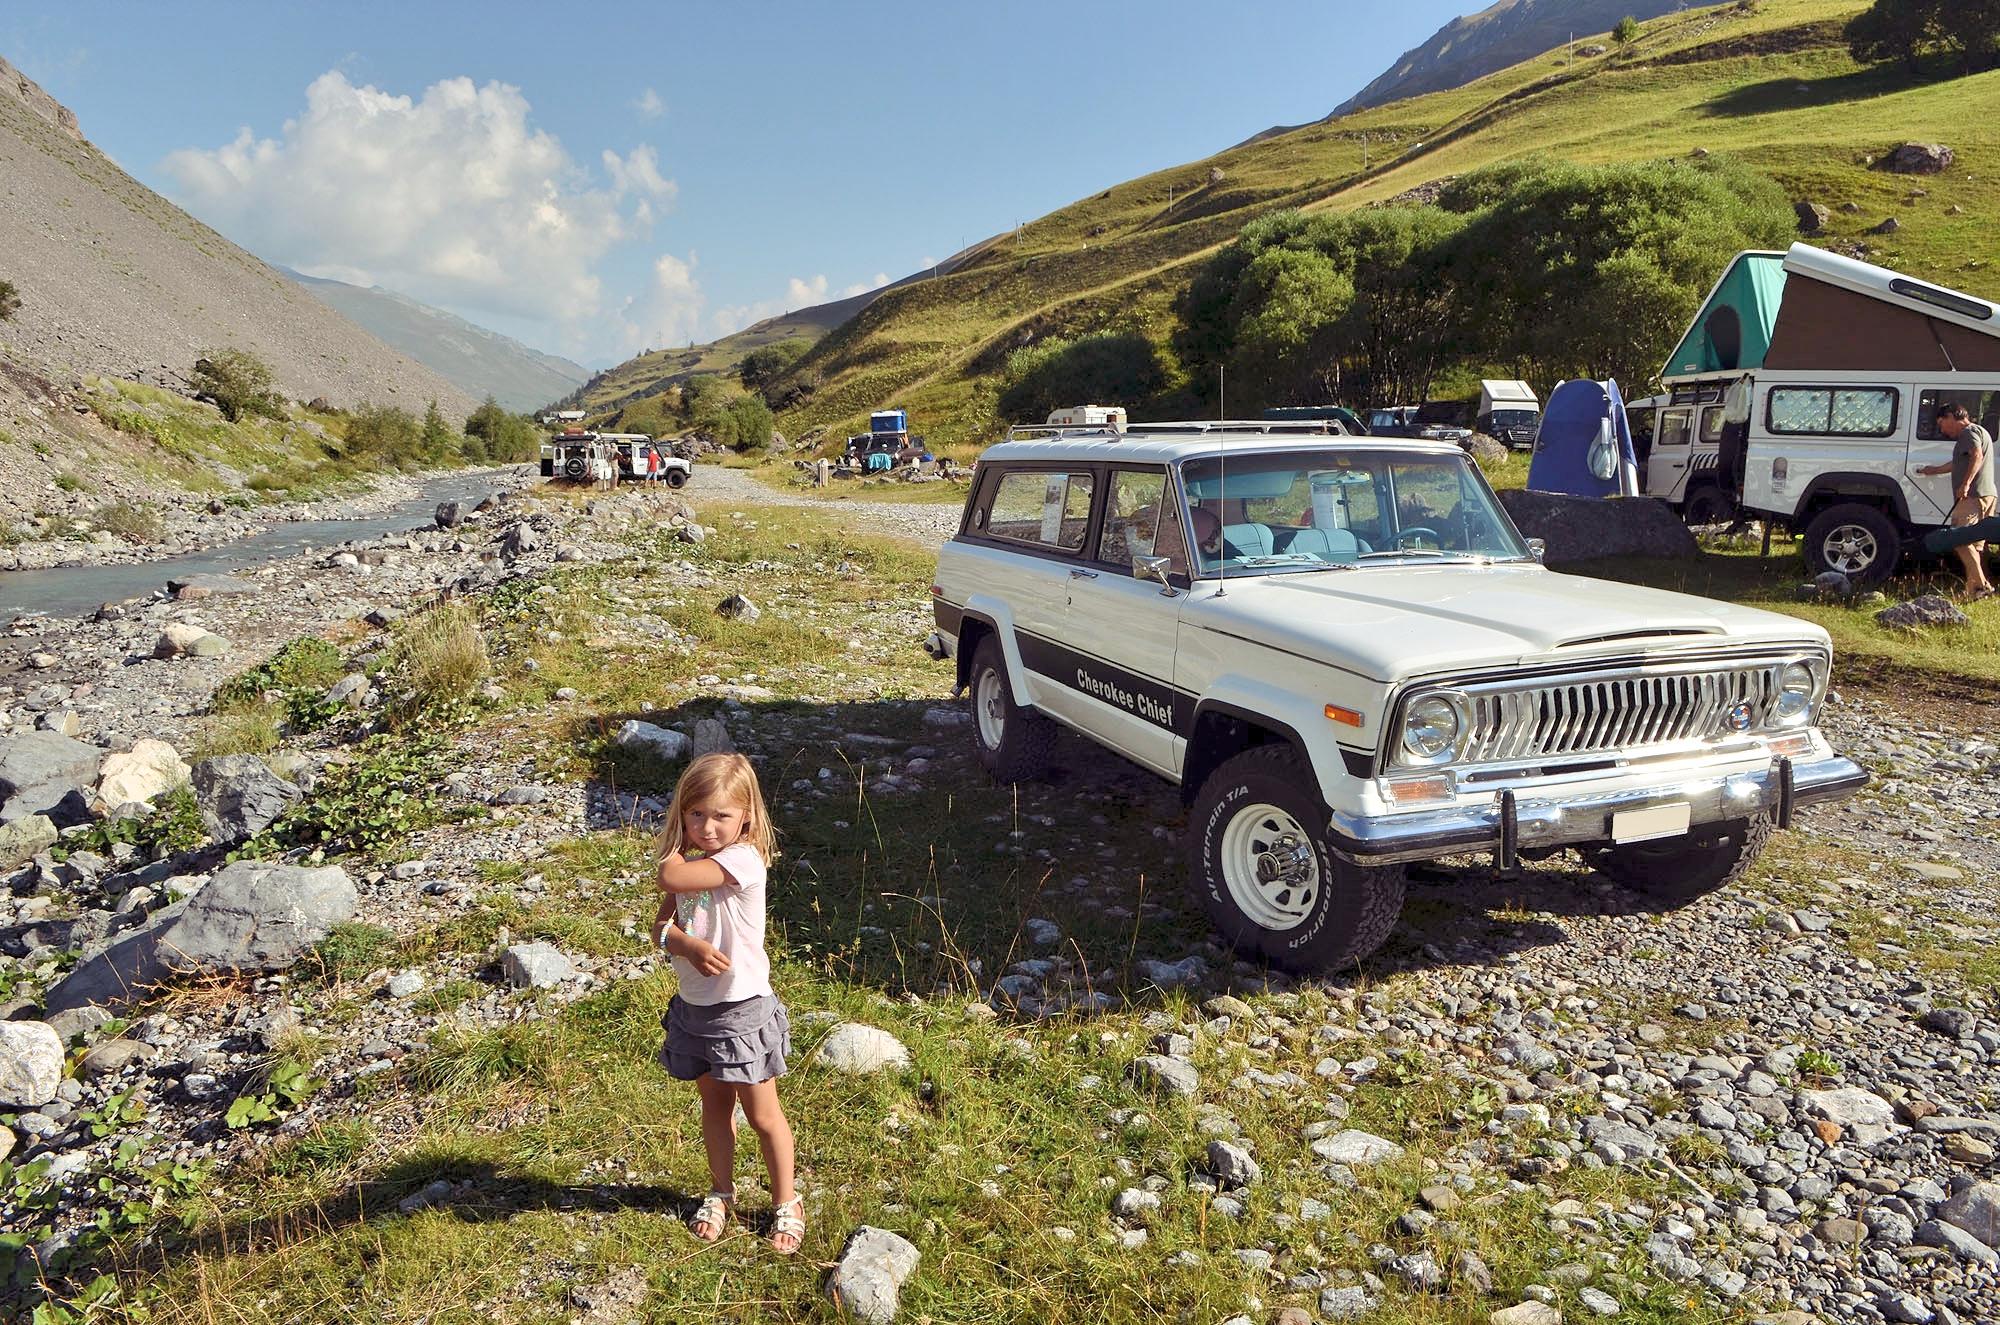 jeep-cherokee-chief-valloire-169.JPG